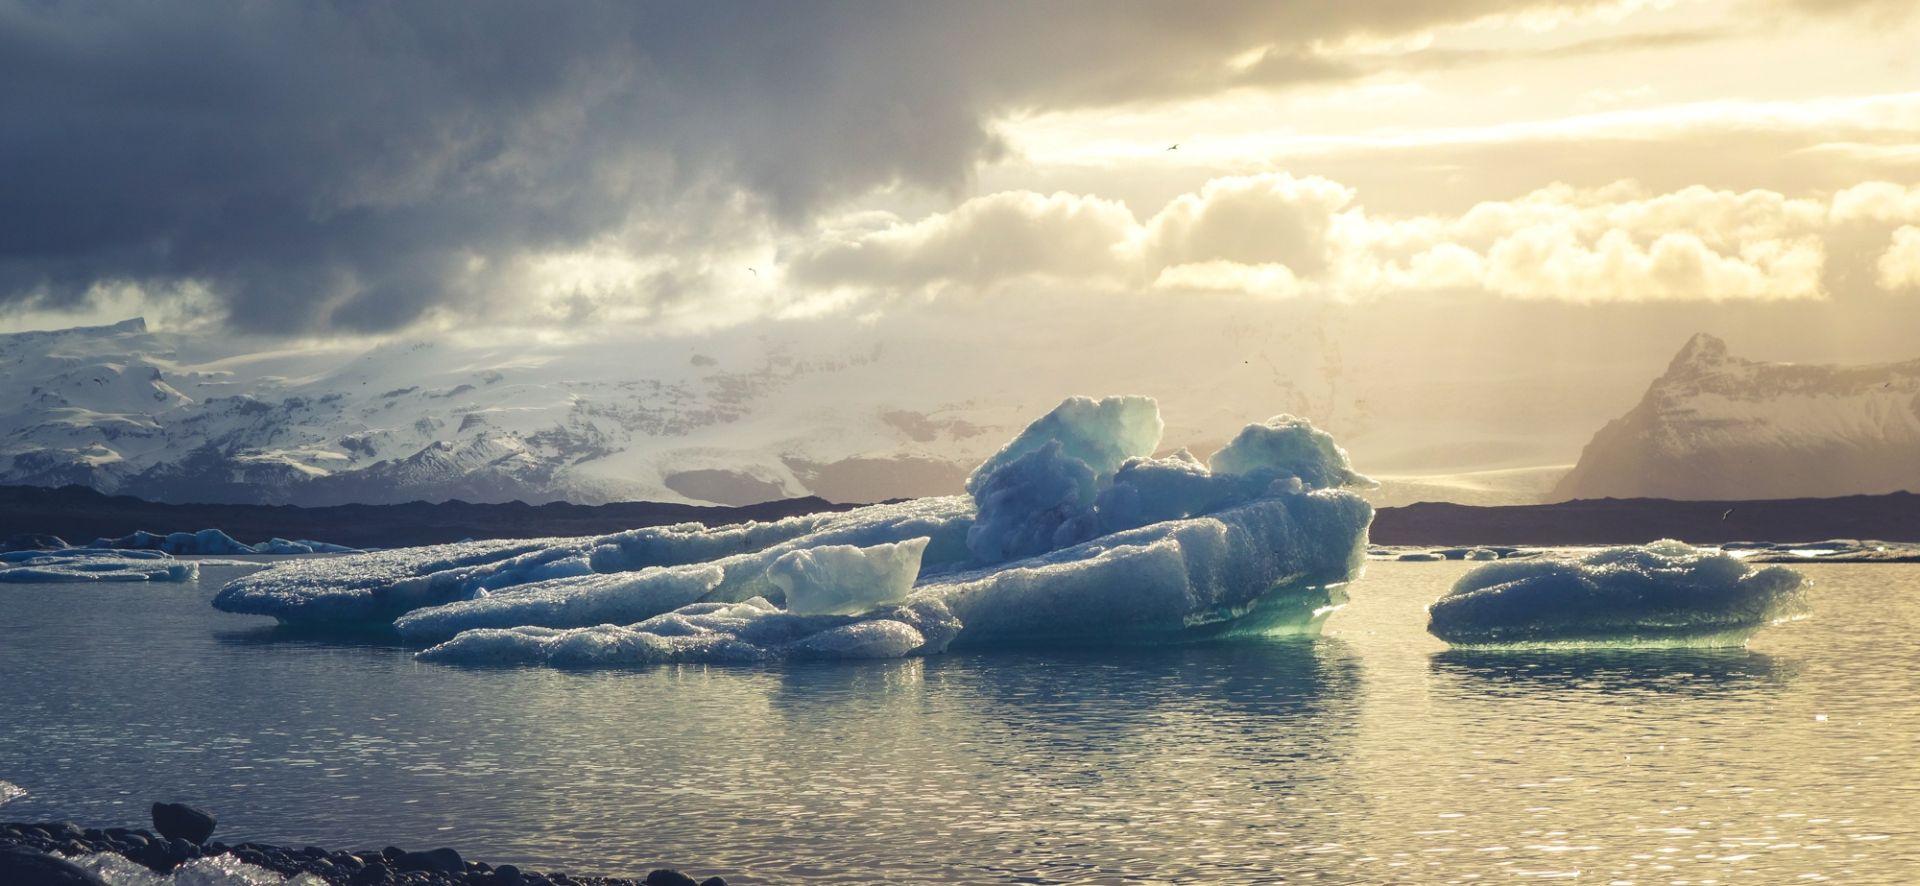 Znanstvenici: Otapanje ledenjaka usporava vrtnju Zemlje